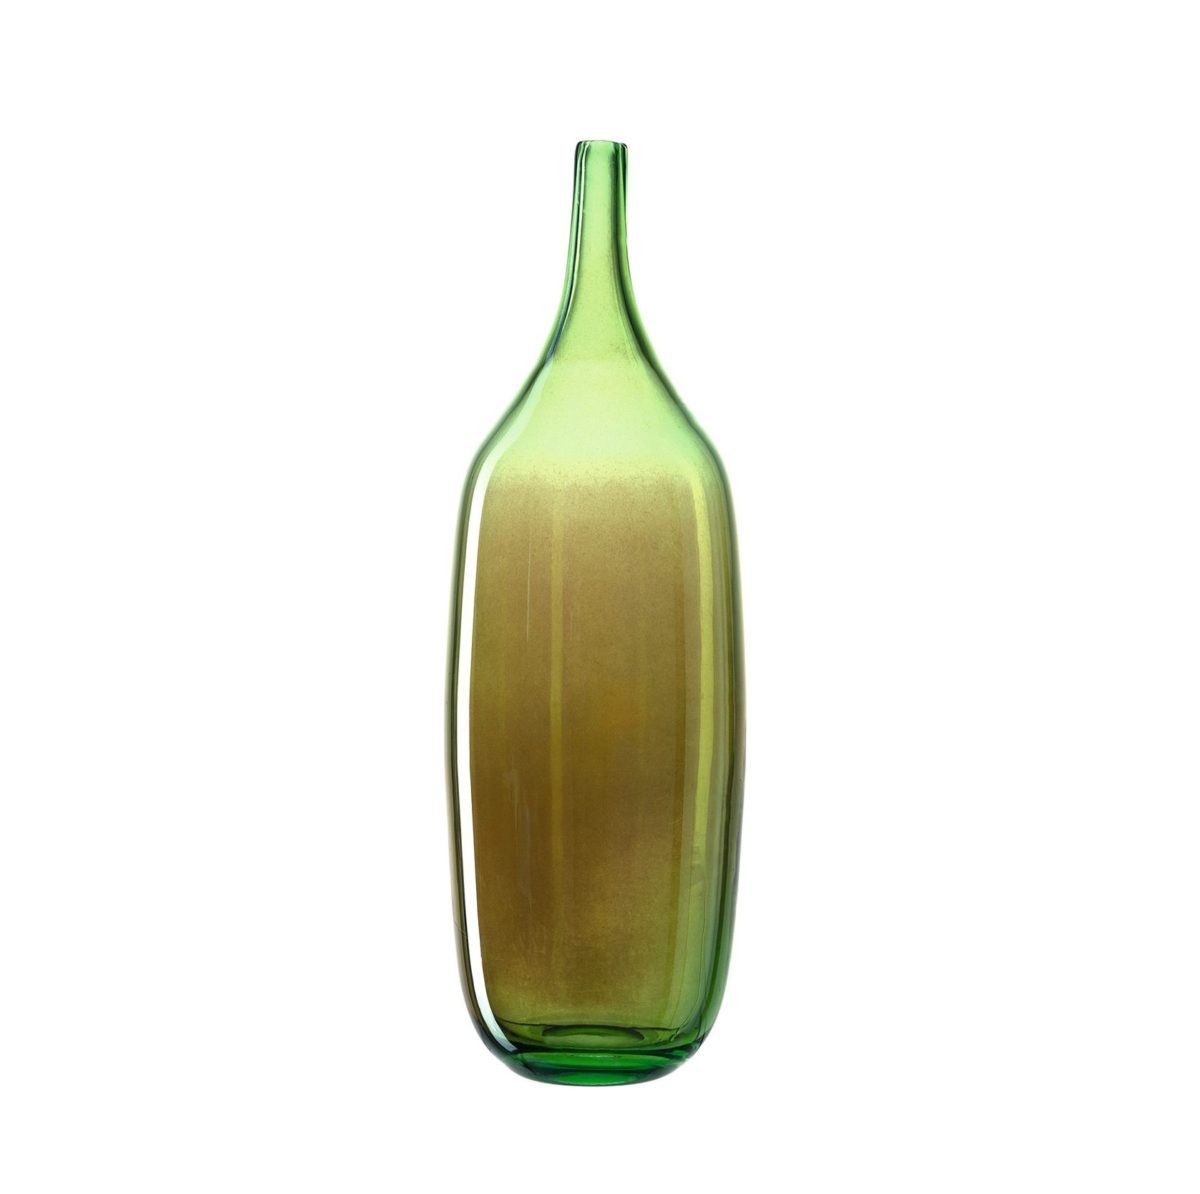 020820 0 k 1 1200x1194 - Vază luster Lucente green 46 cm (L020820)